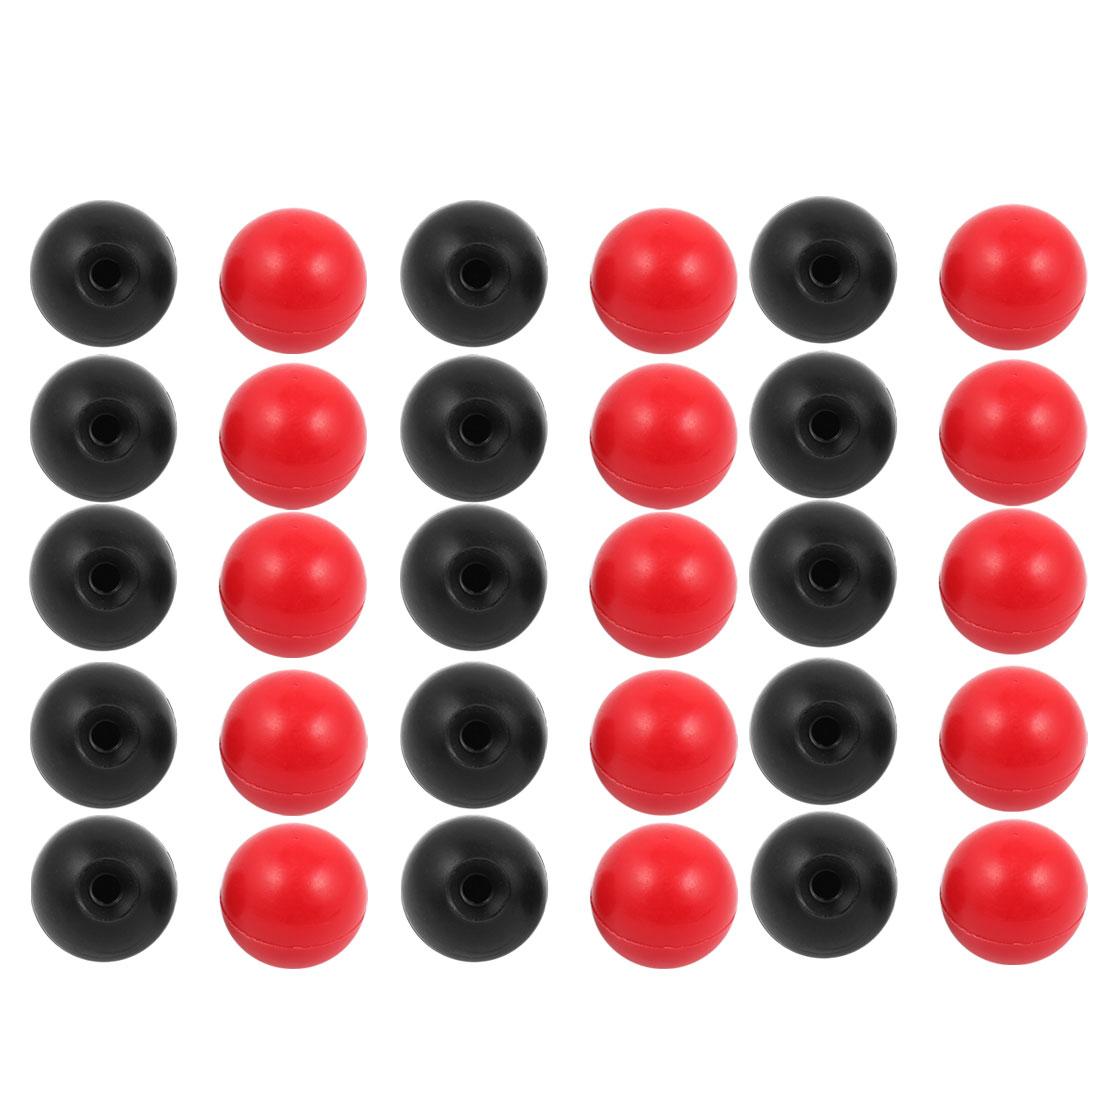 30Pcs Plastic Round Handle Ball Knob M8 Threaded 35mm Dia Mixed Color